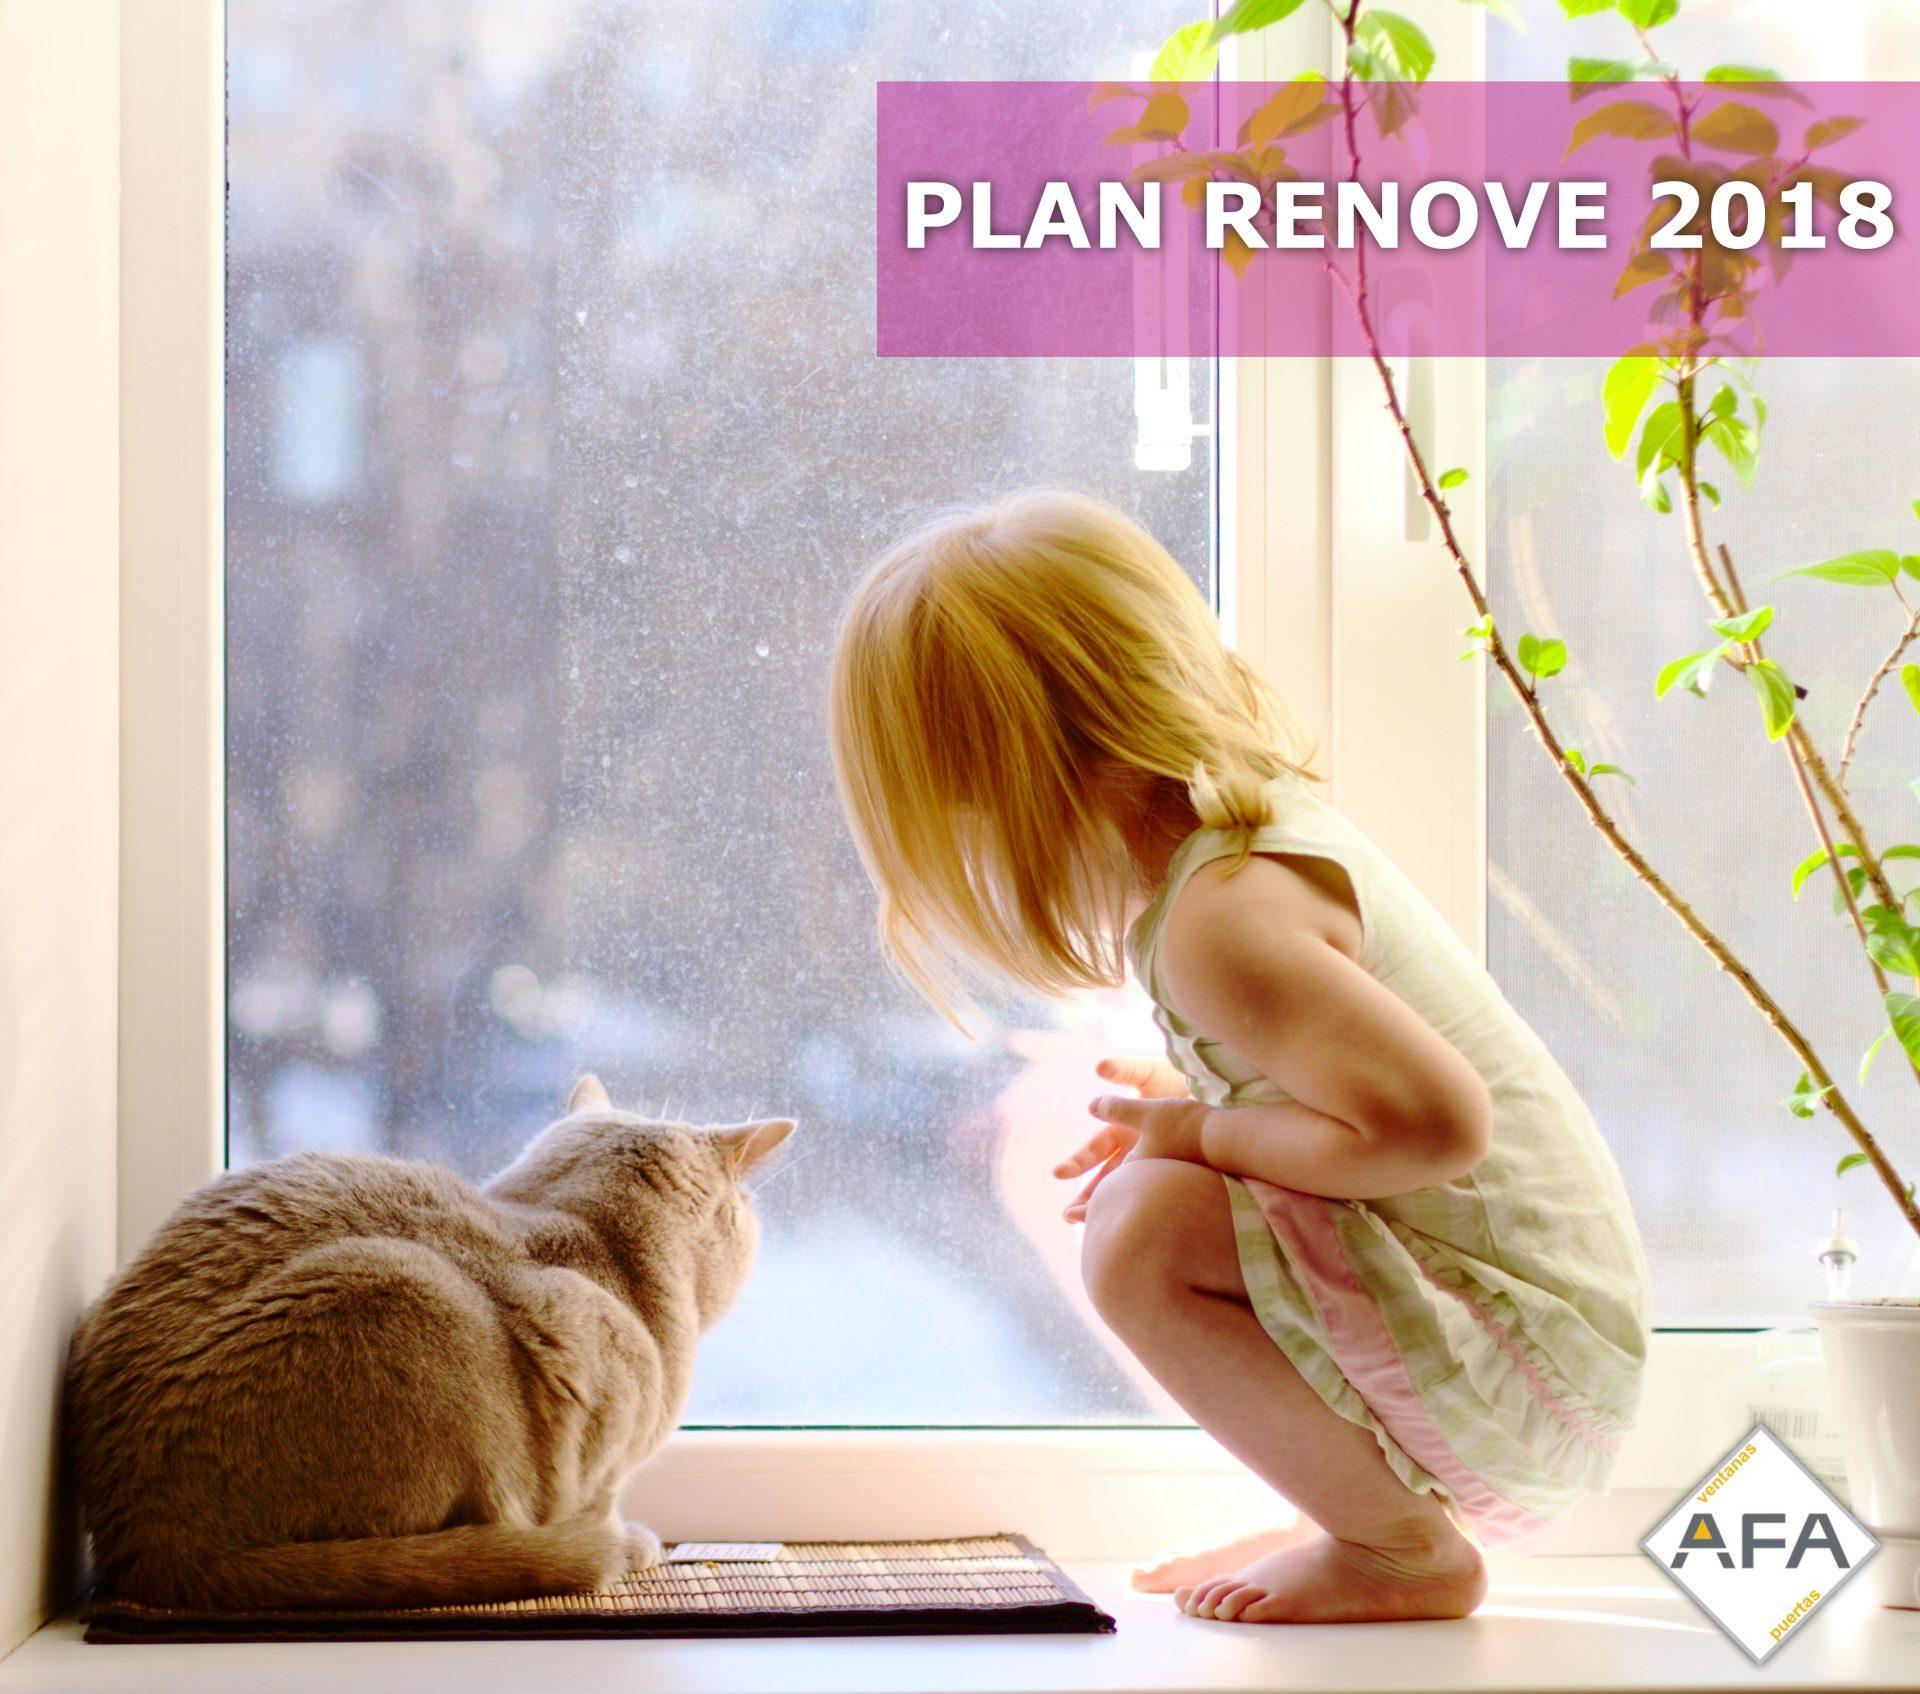 Plan Renove de Ventanas 2018